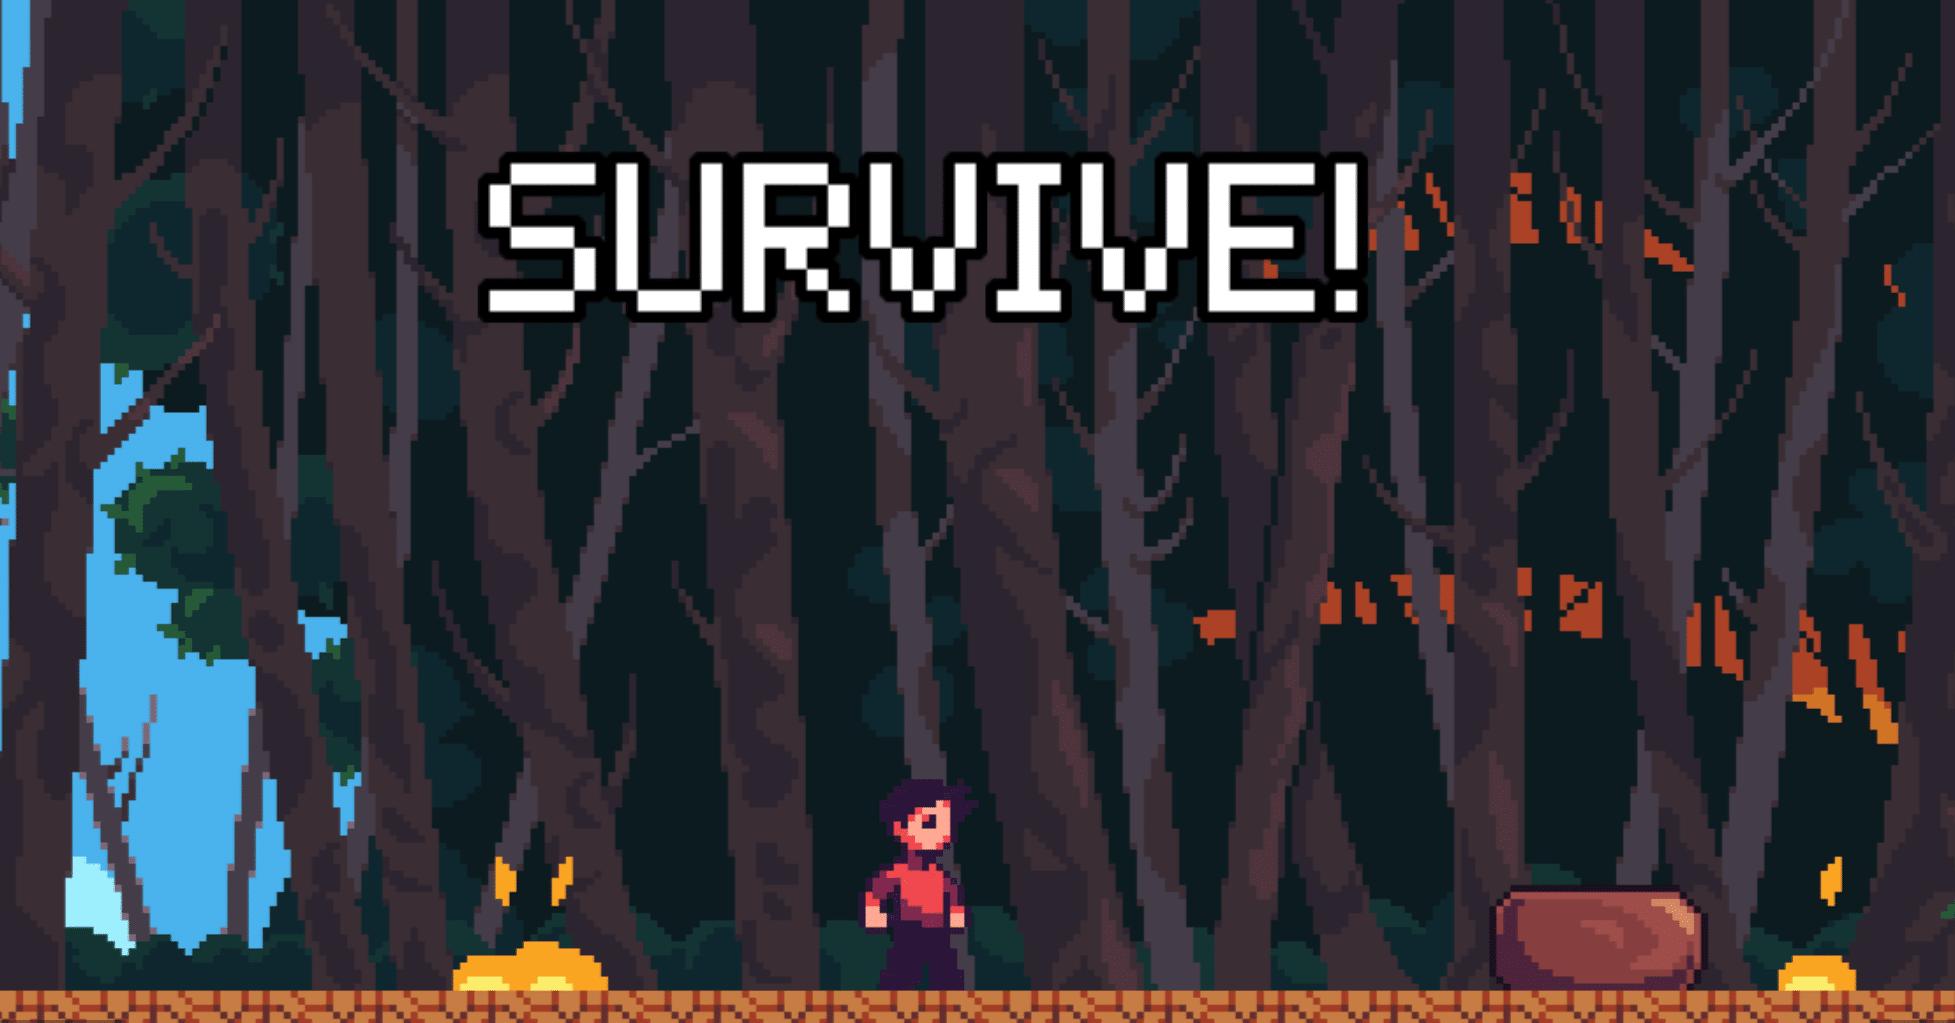 jeu 2020 pixel art feu australie survie aventure